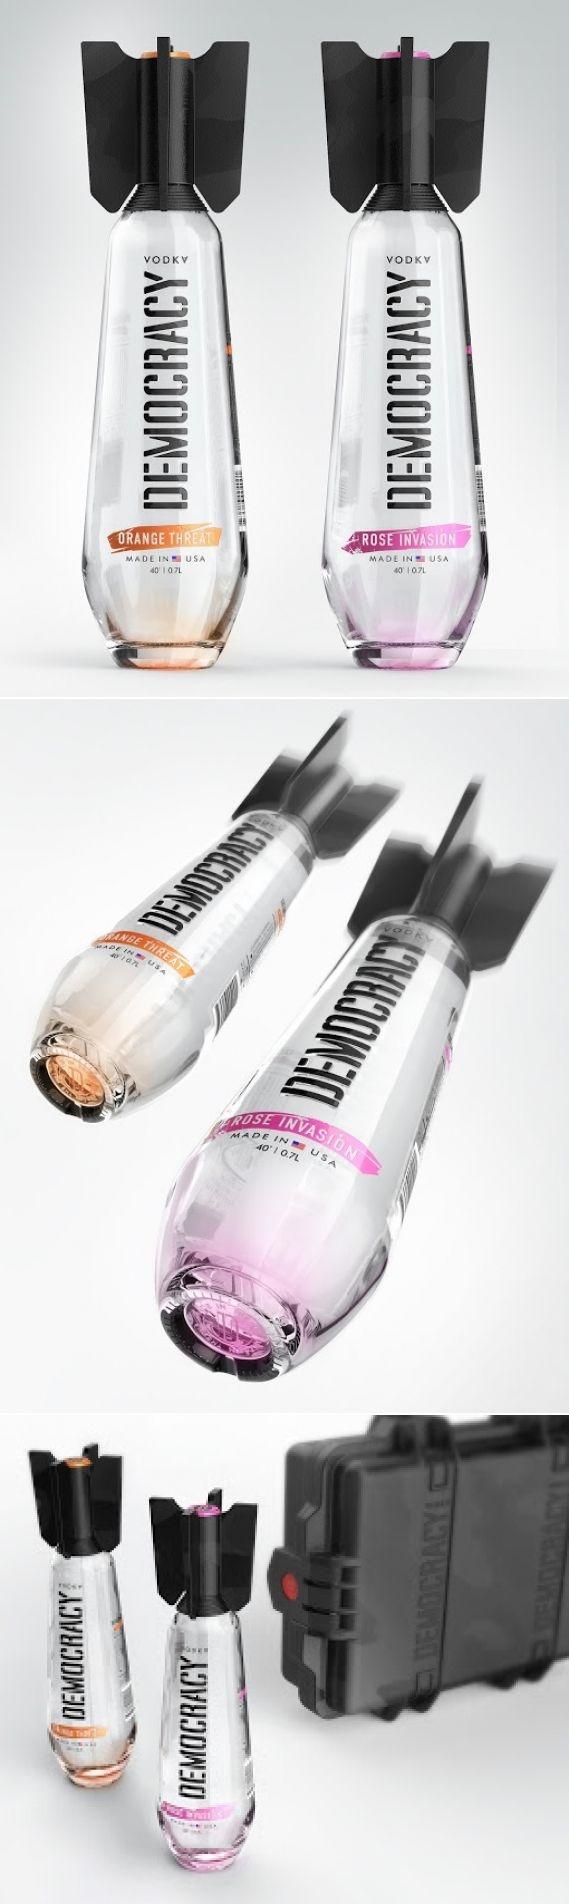 vodkabotella diseño